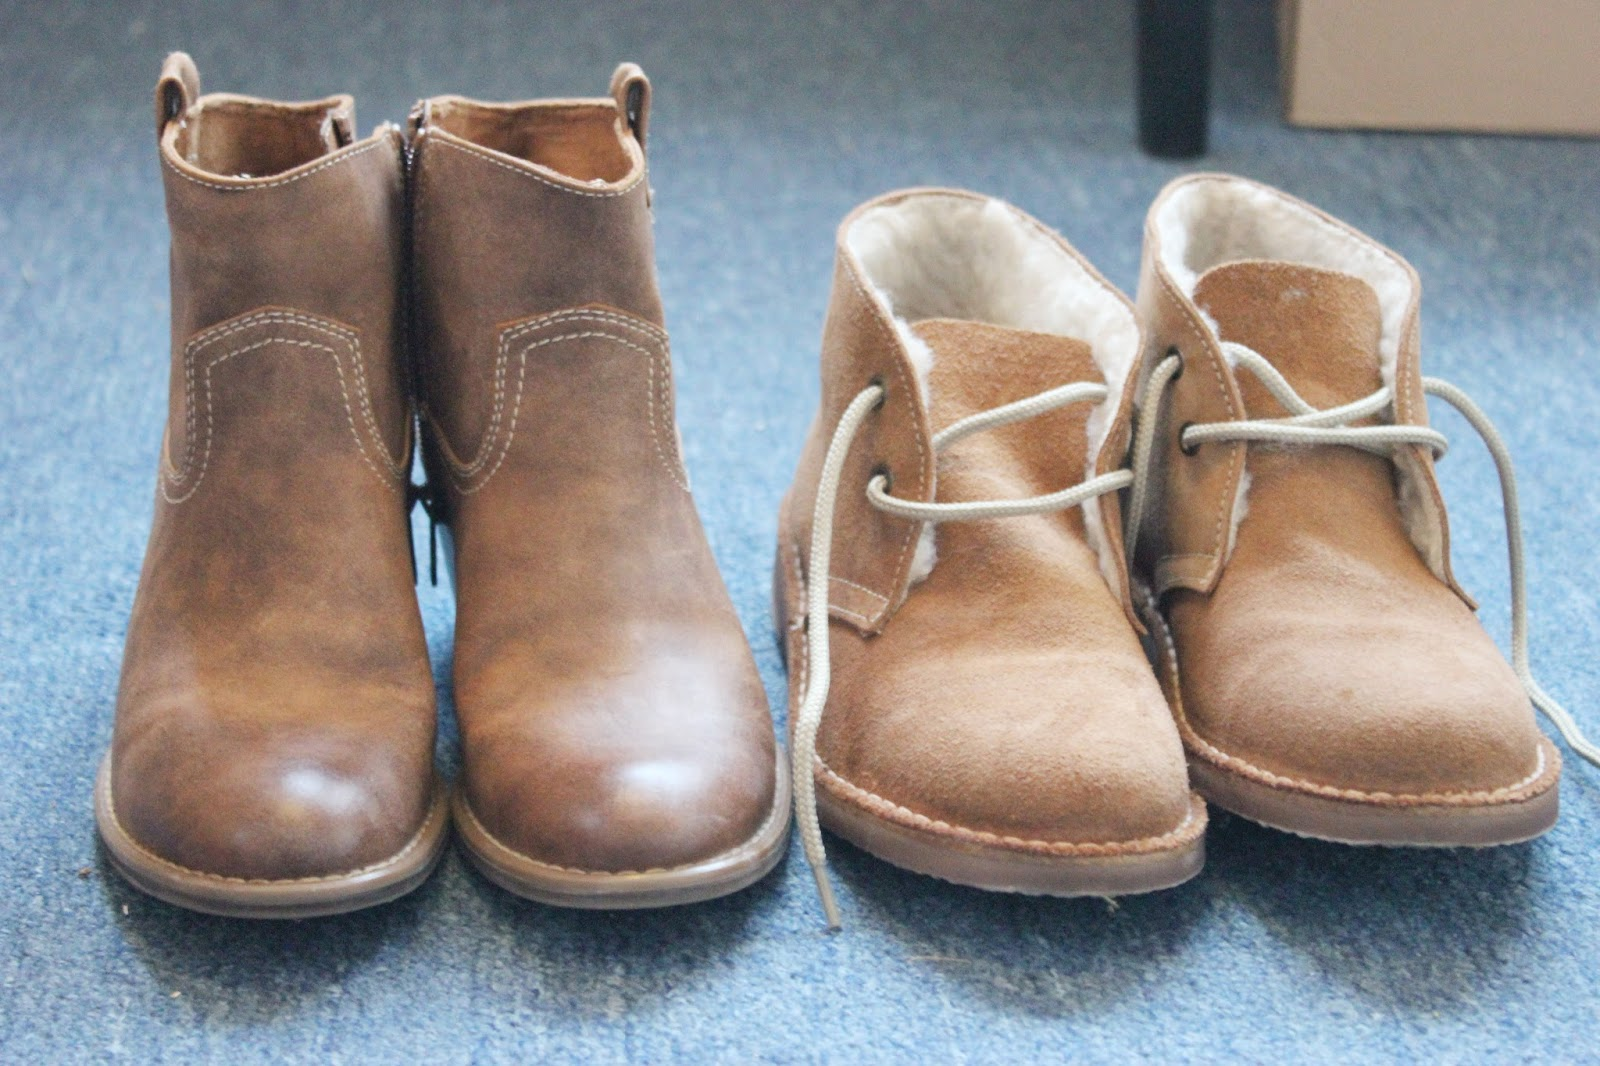 Budget Boots New Shoes amp; Life Beste The Tips In ☞ Om De Sarenza ISEUqnYE